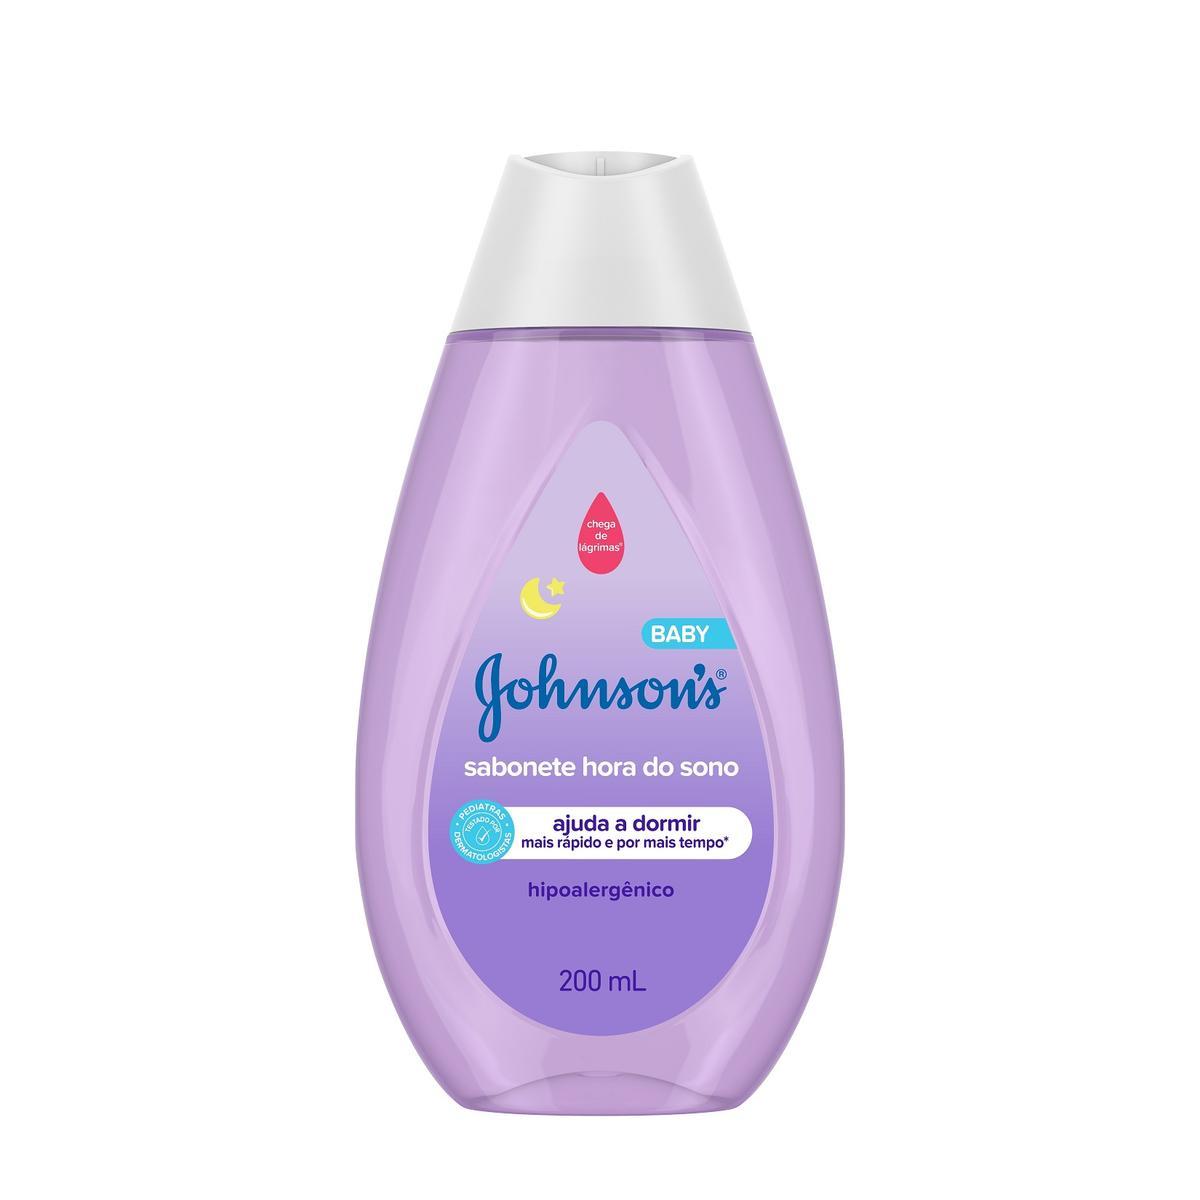 JOHNSON'S® Sabonete Líquido Hora Do Sono 200ml front